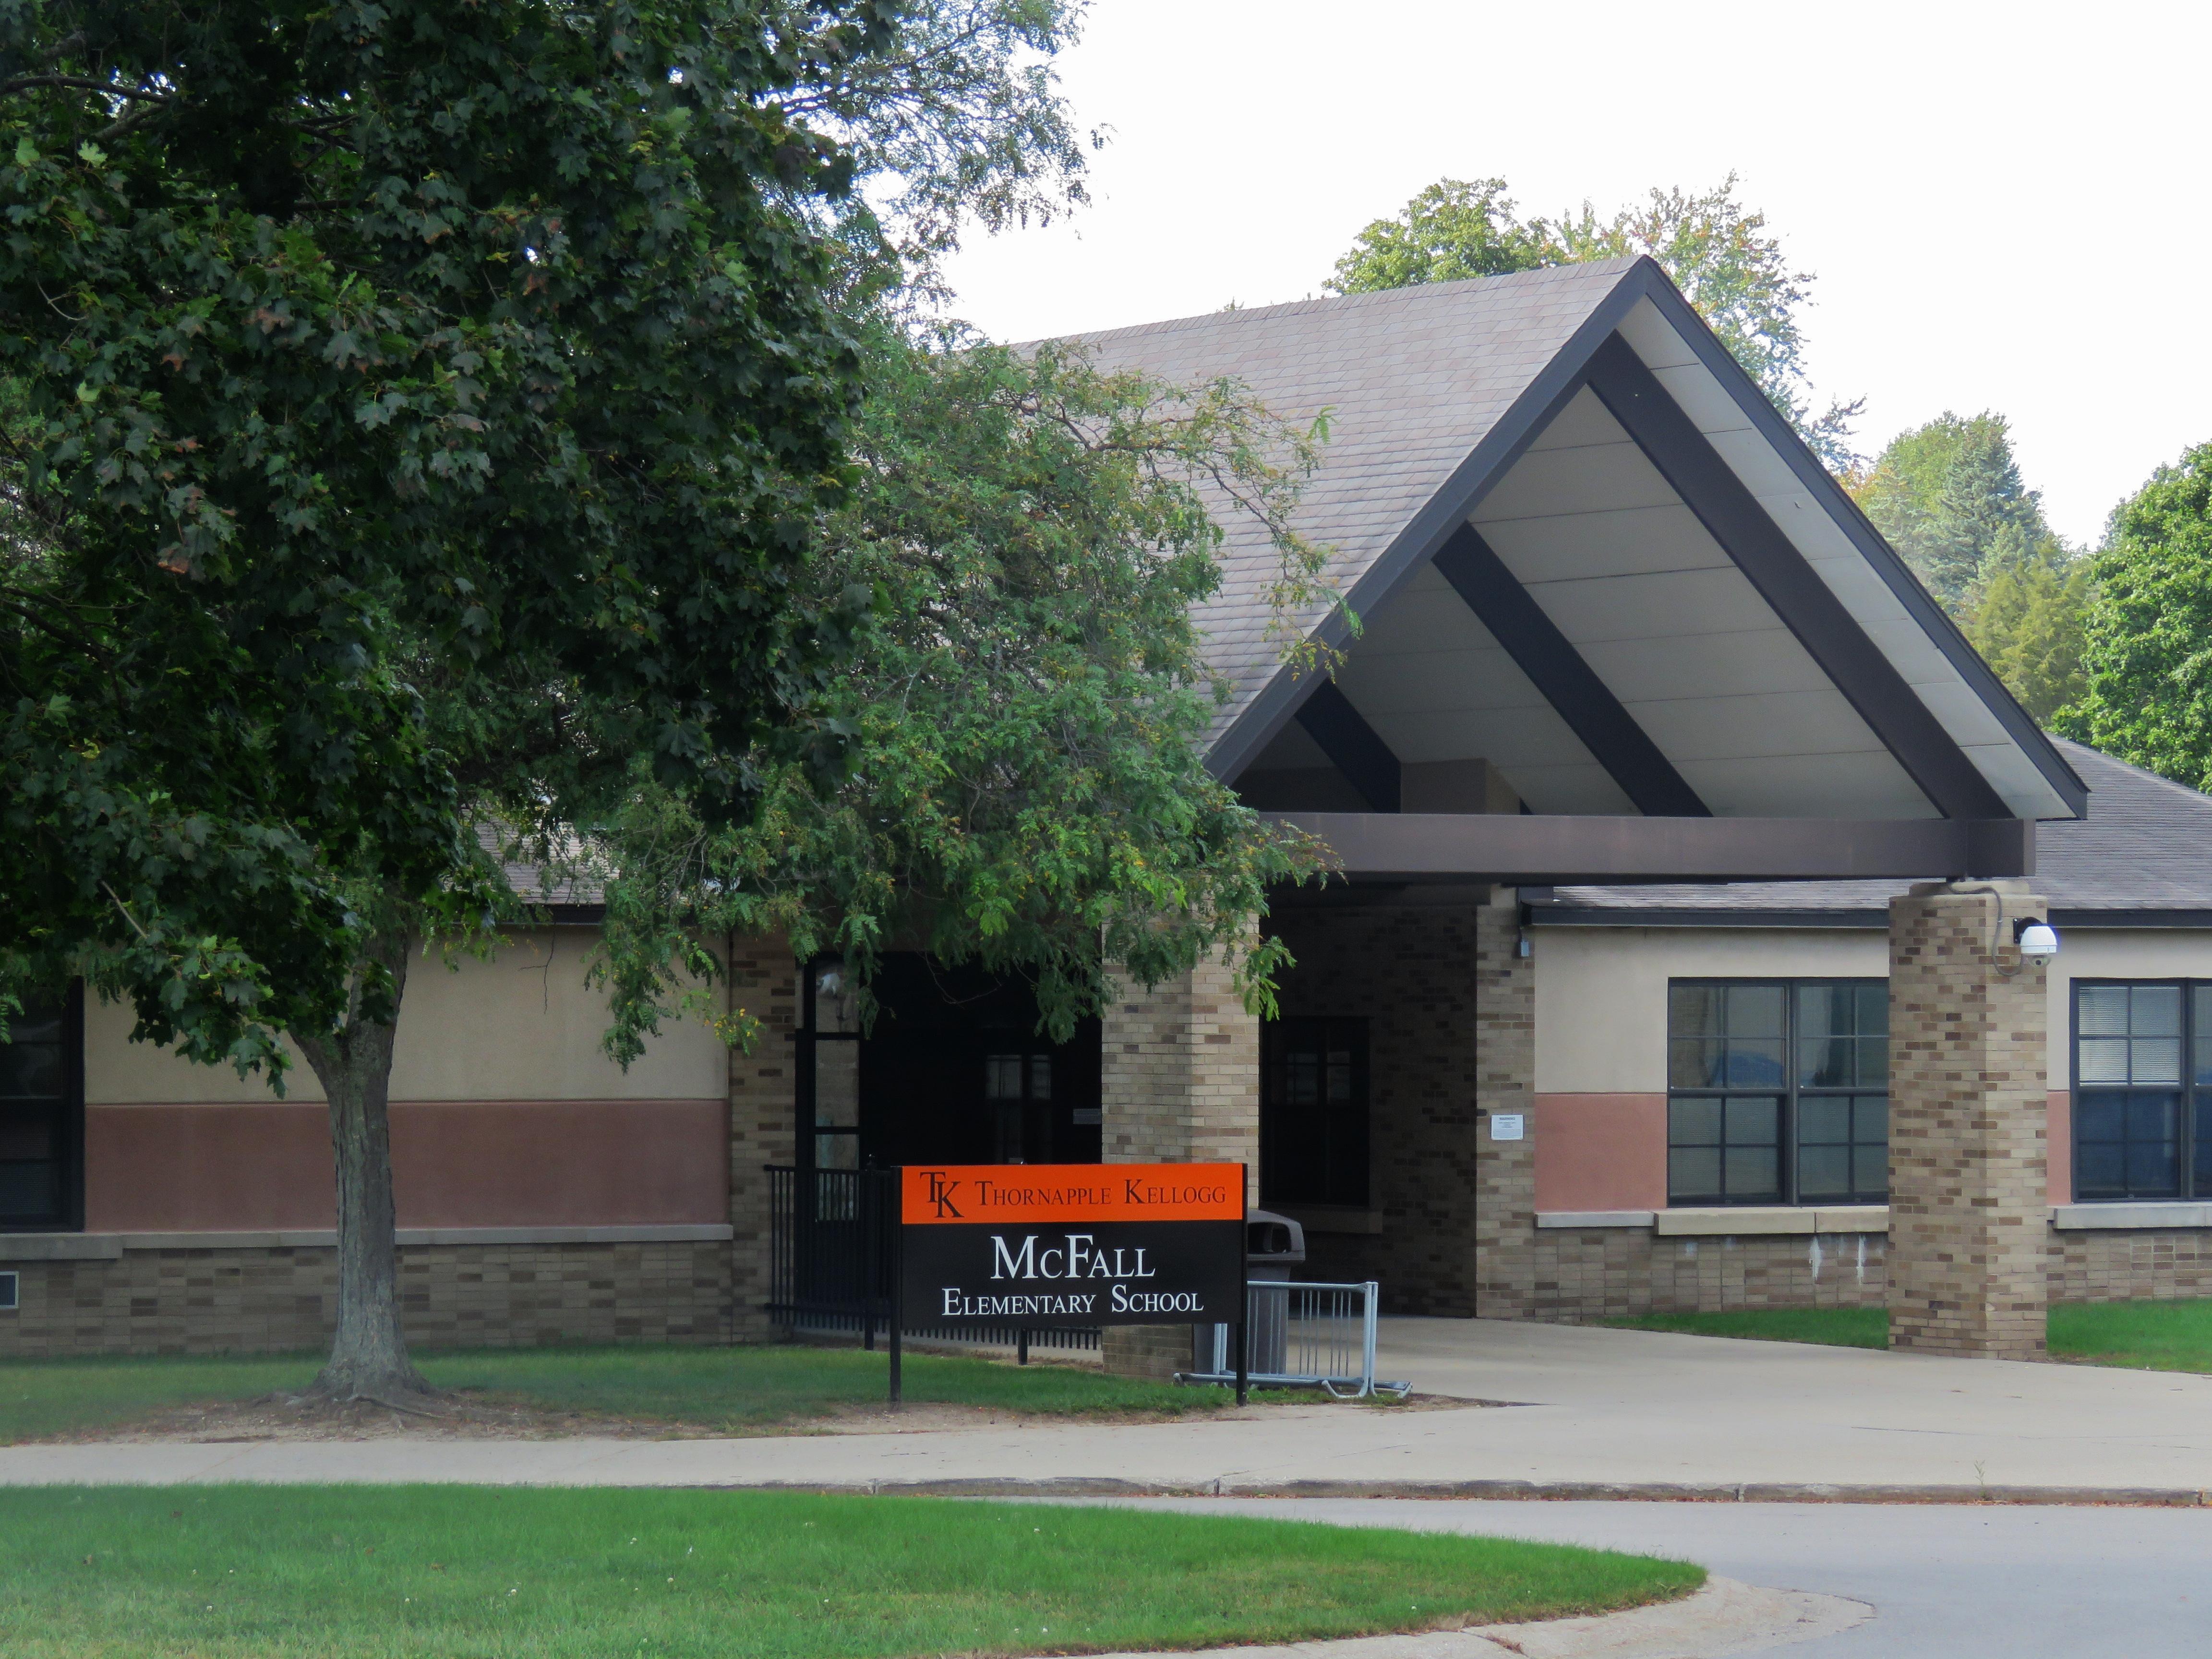 McFall Elementary School